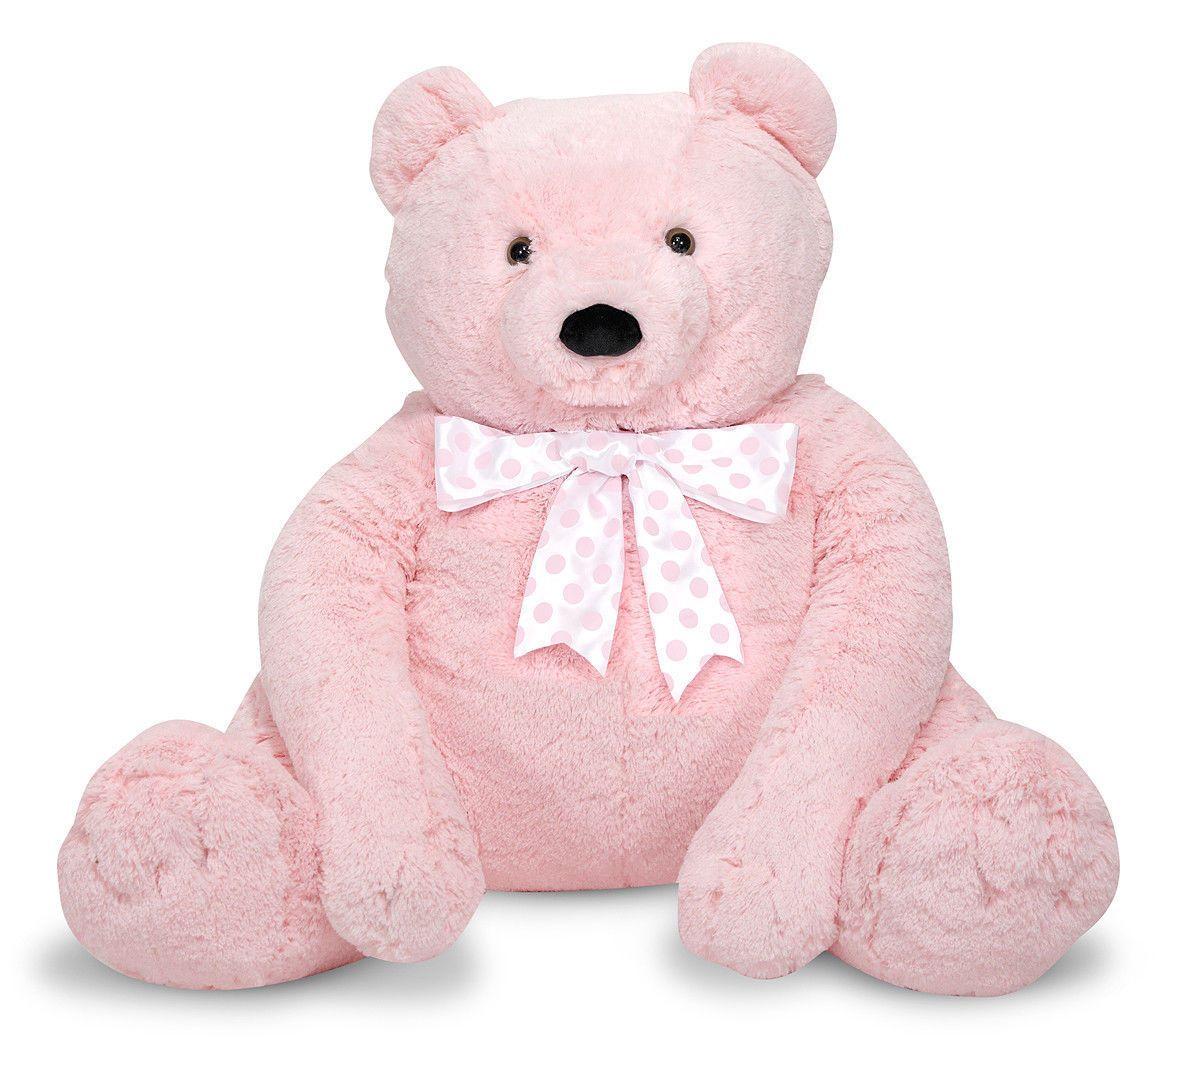 Big Pink Bear White Stuff Plush Teddy Animal Adventure Corduroy Valentine Heart Great For Valen Jumbo Teddy Bear Bear Stuffed Animal Teddy Bear Stuffed Animal [ 1066 x 1200 Pixel ]